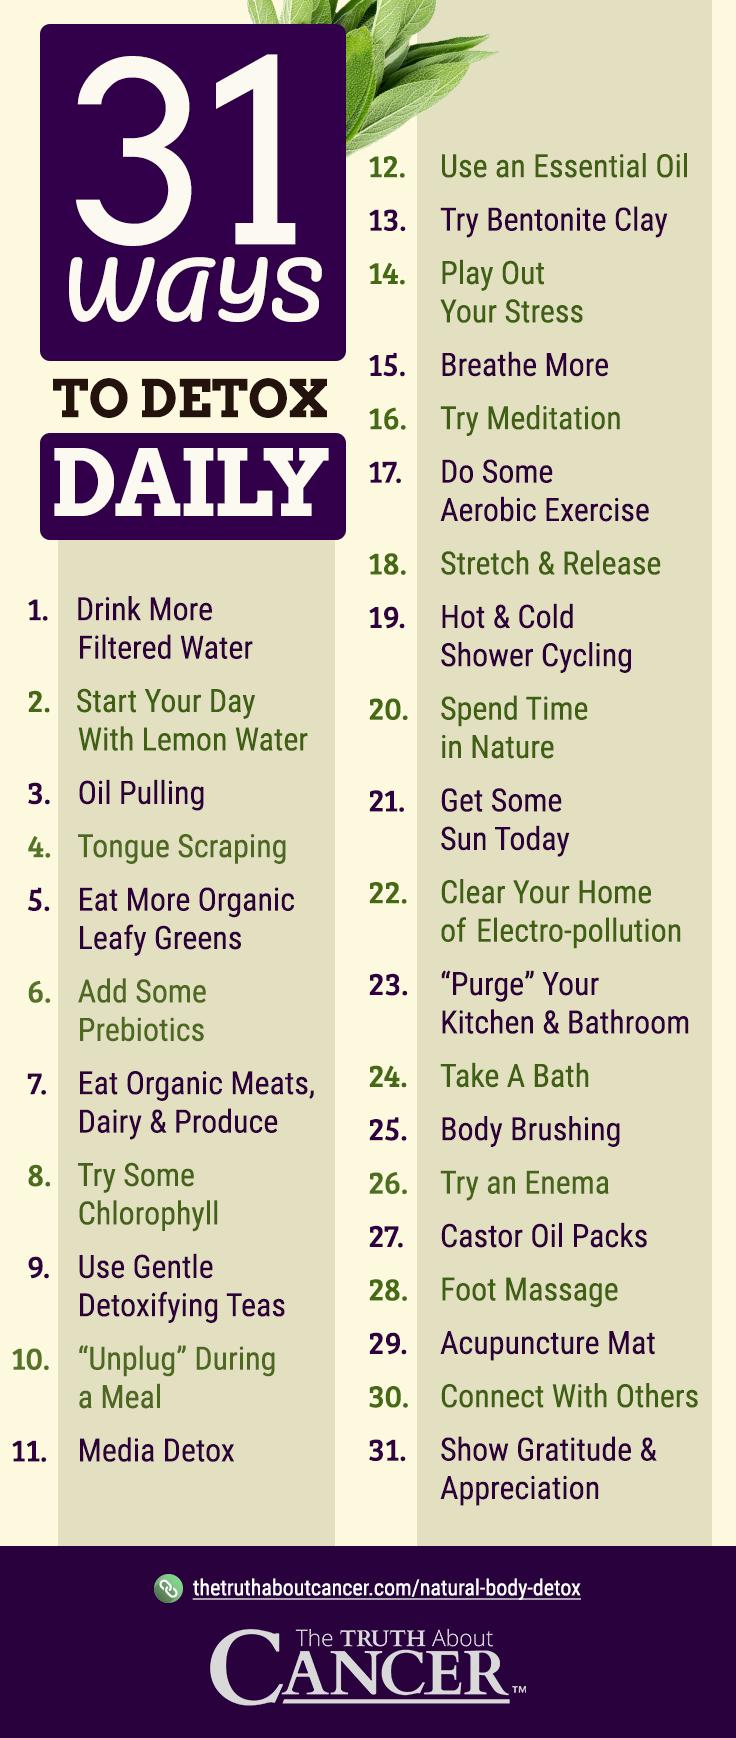 31 Ways to Detox Daily